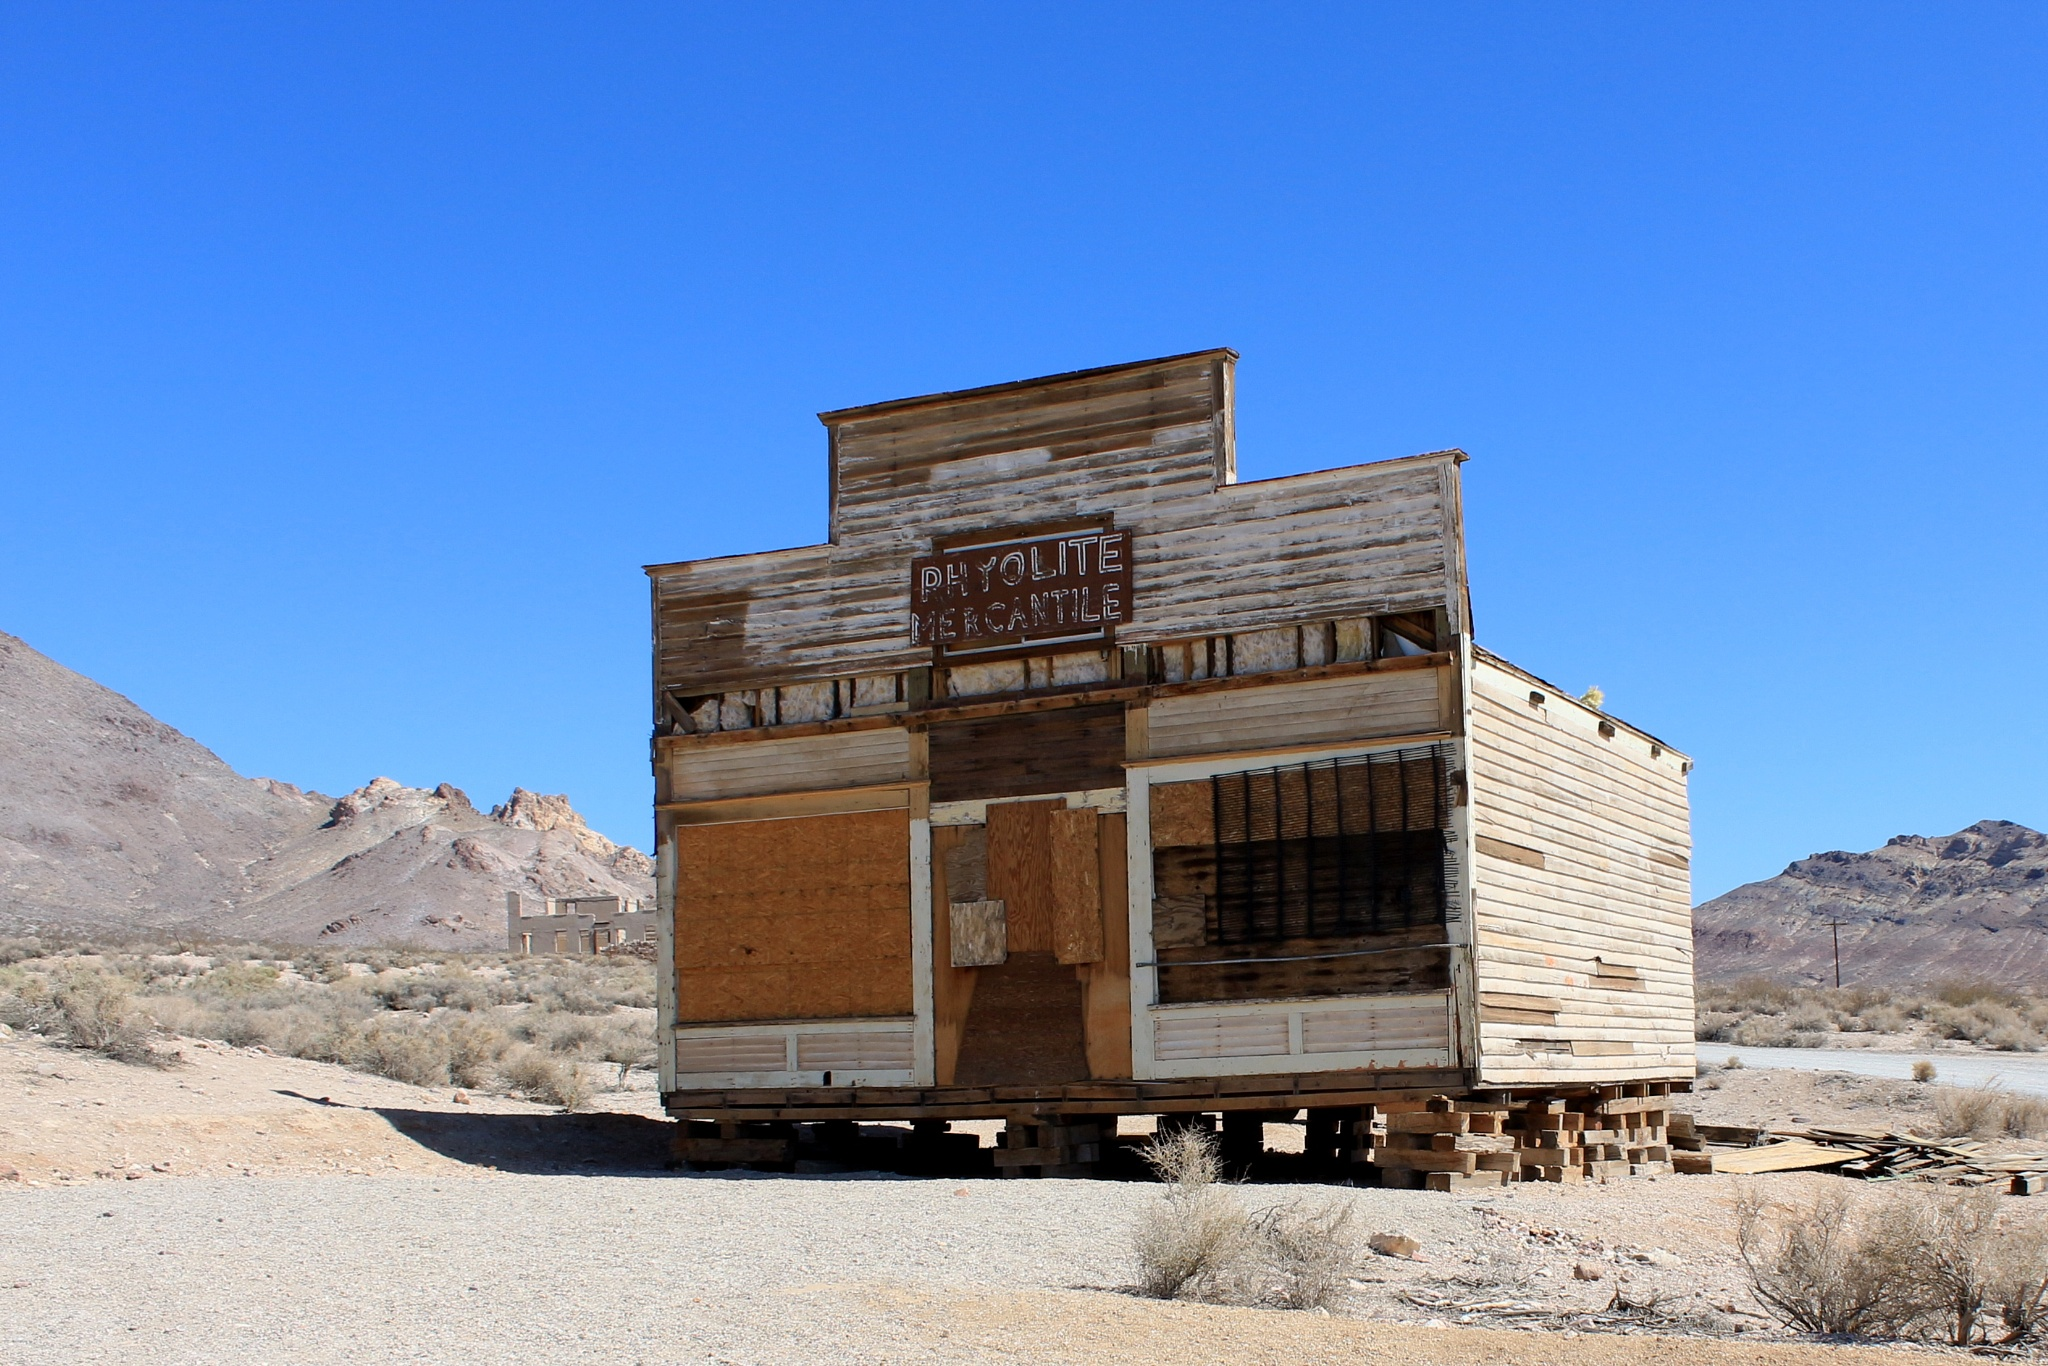 Rhyolite Mercantile, Nevada. by katze